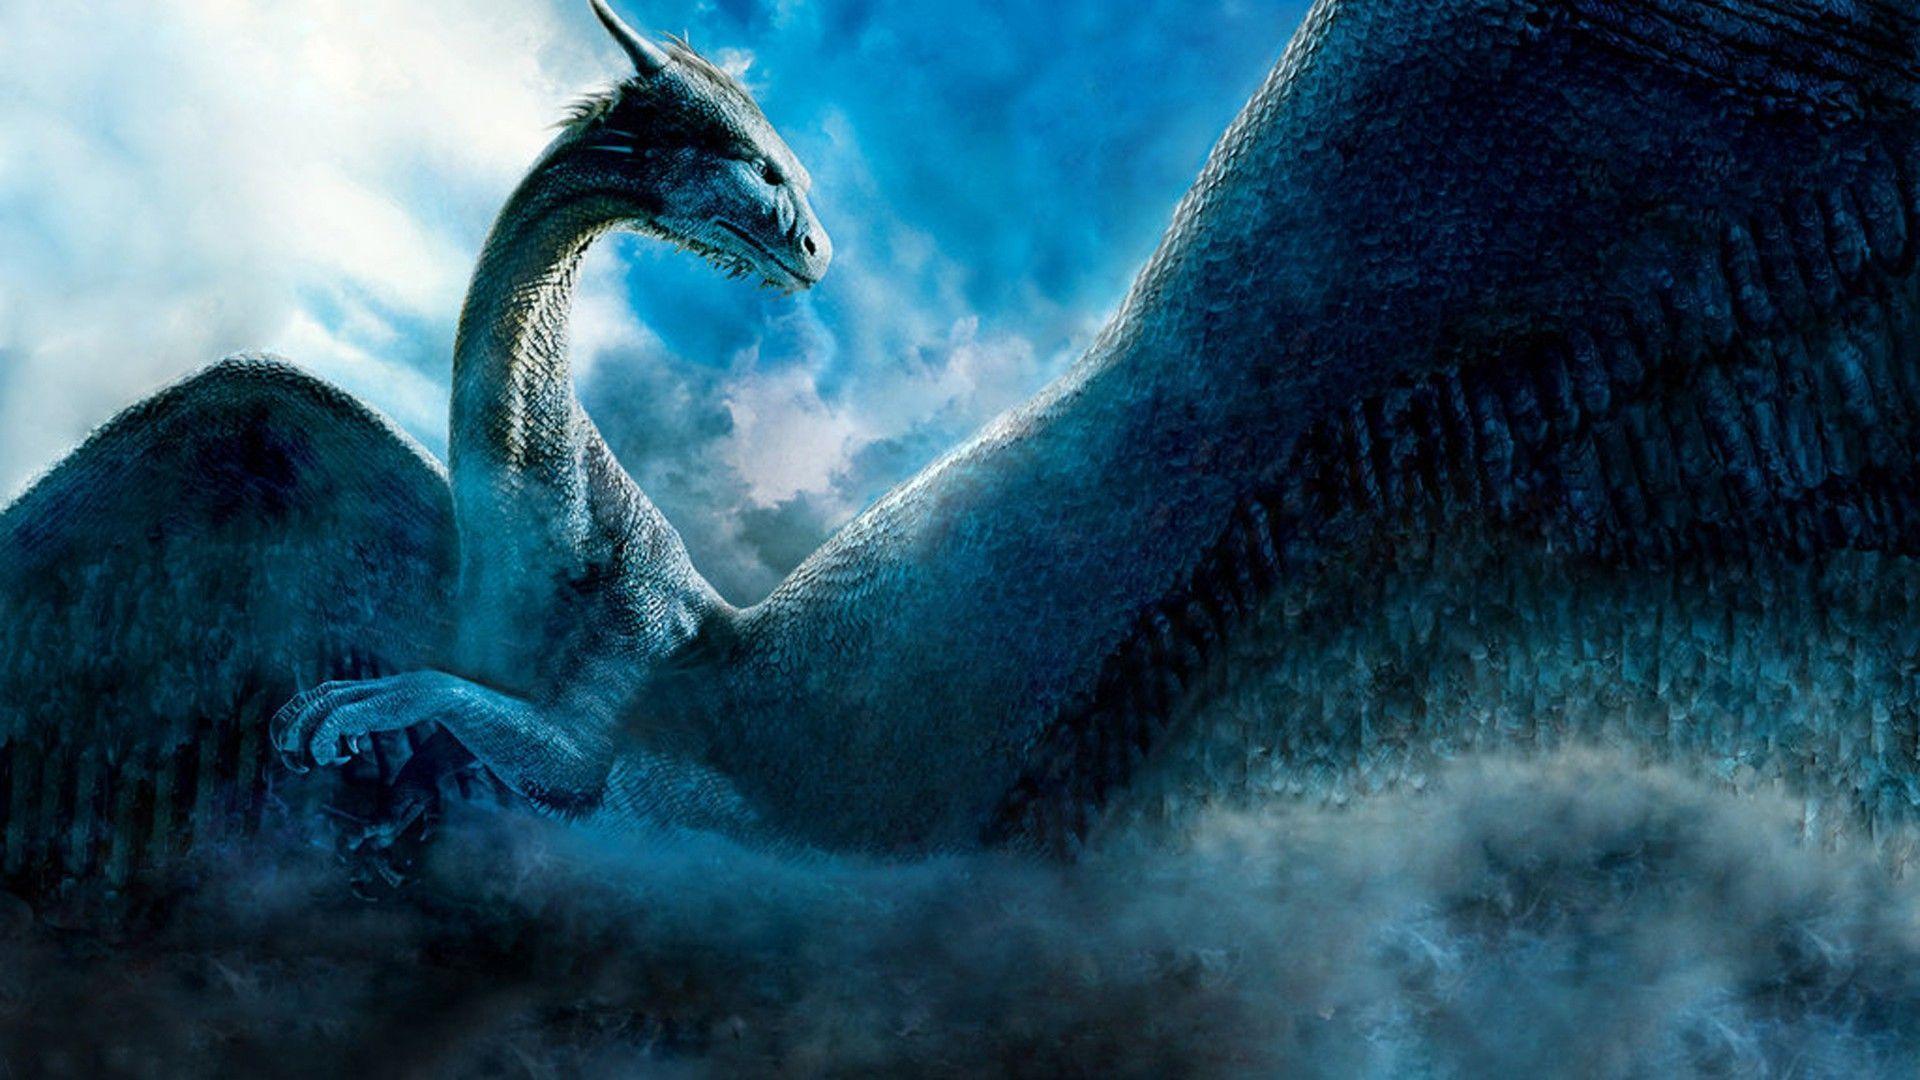 Dragon Wallpapers 1080p Wallpaper Cave